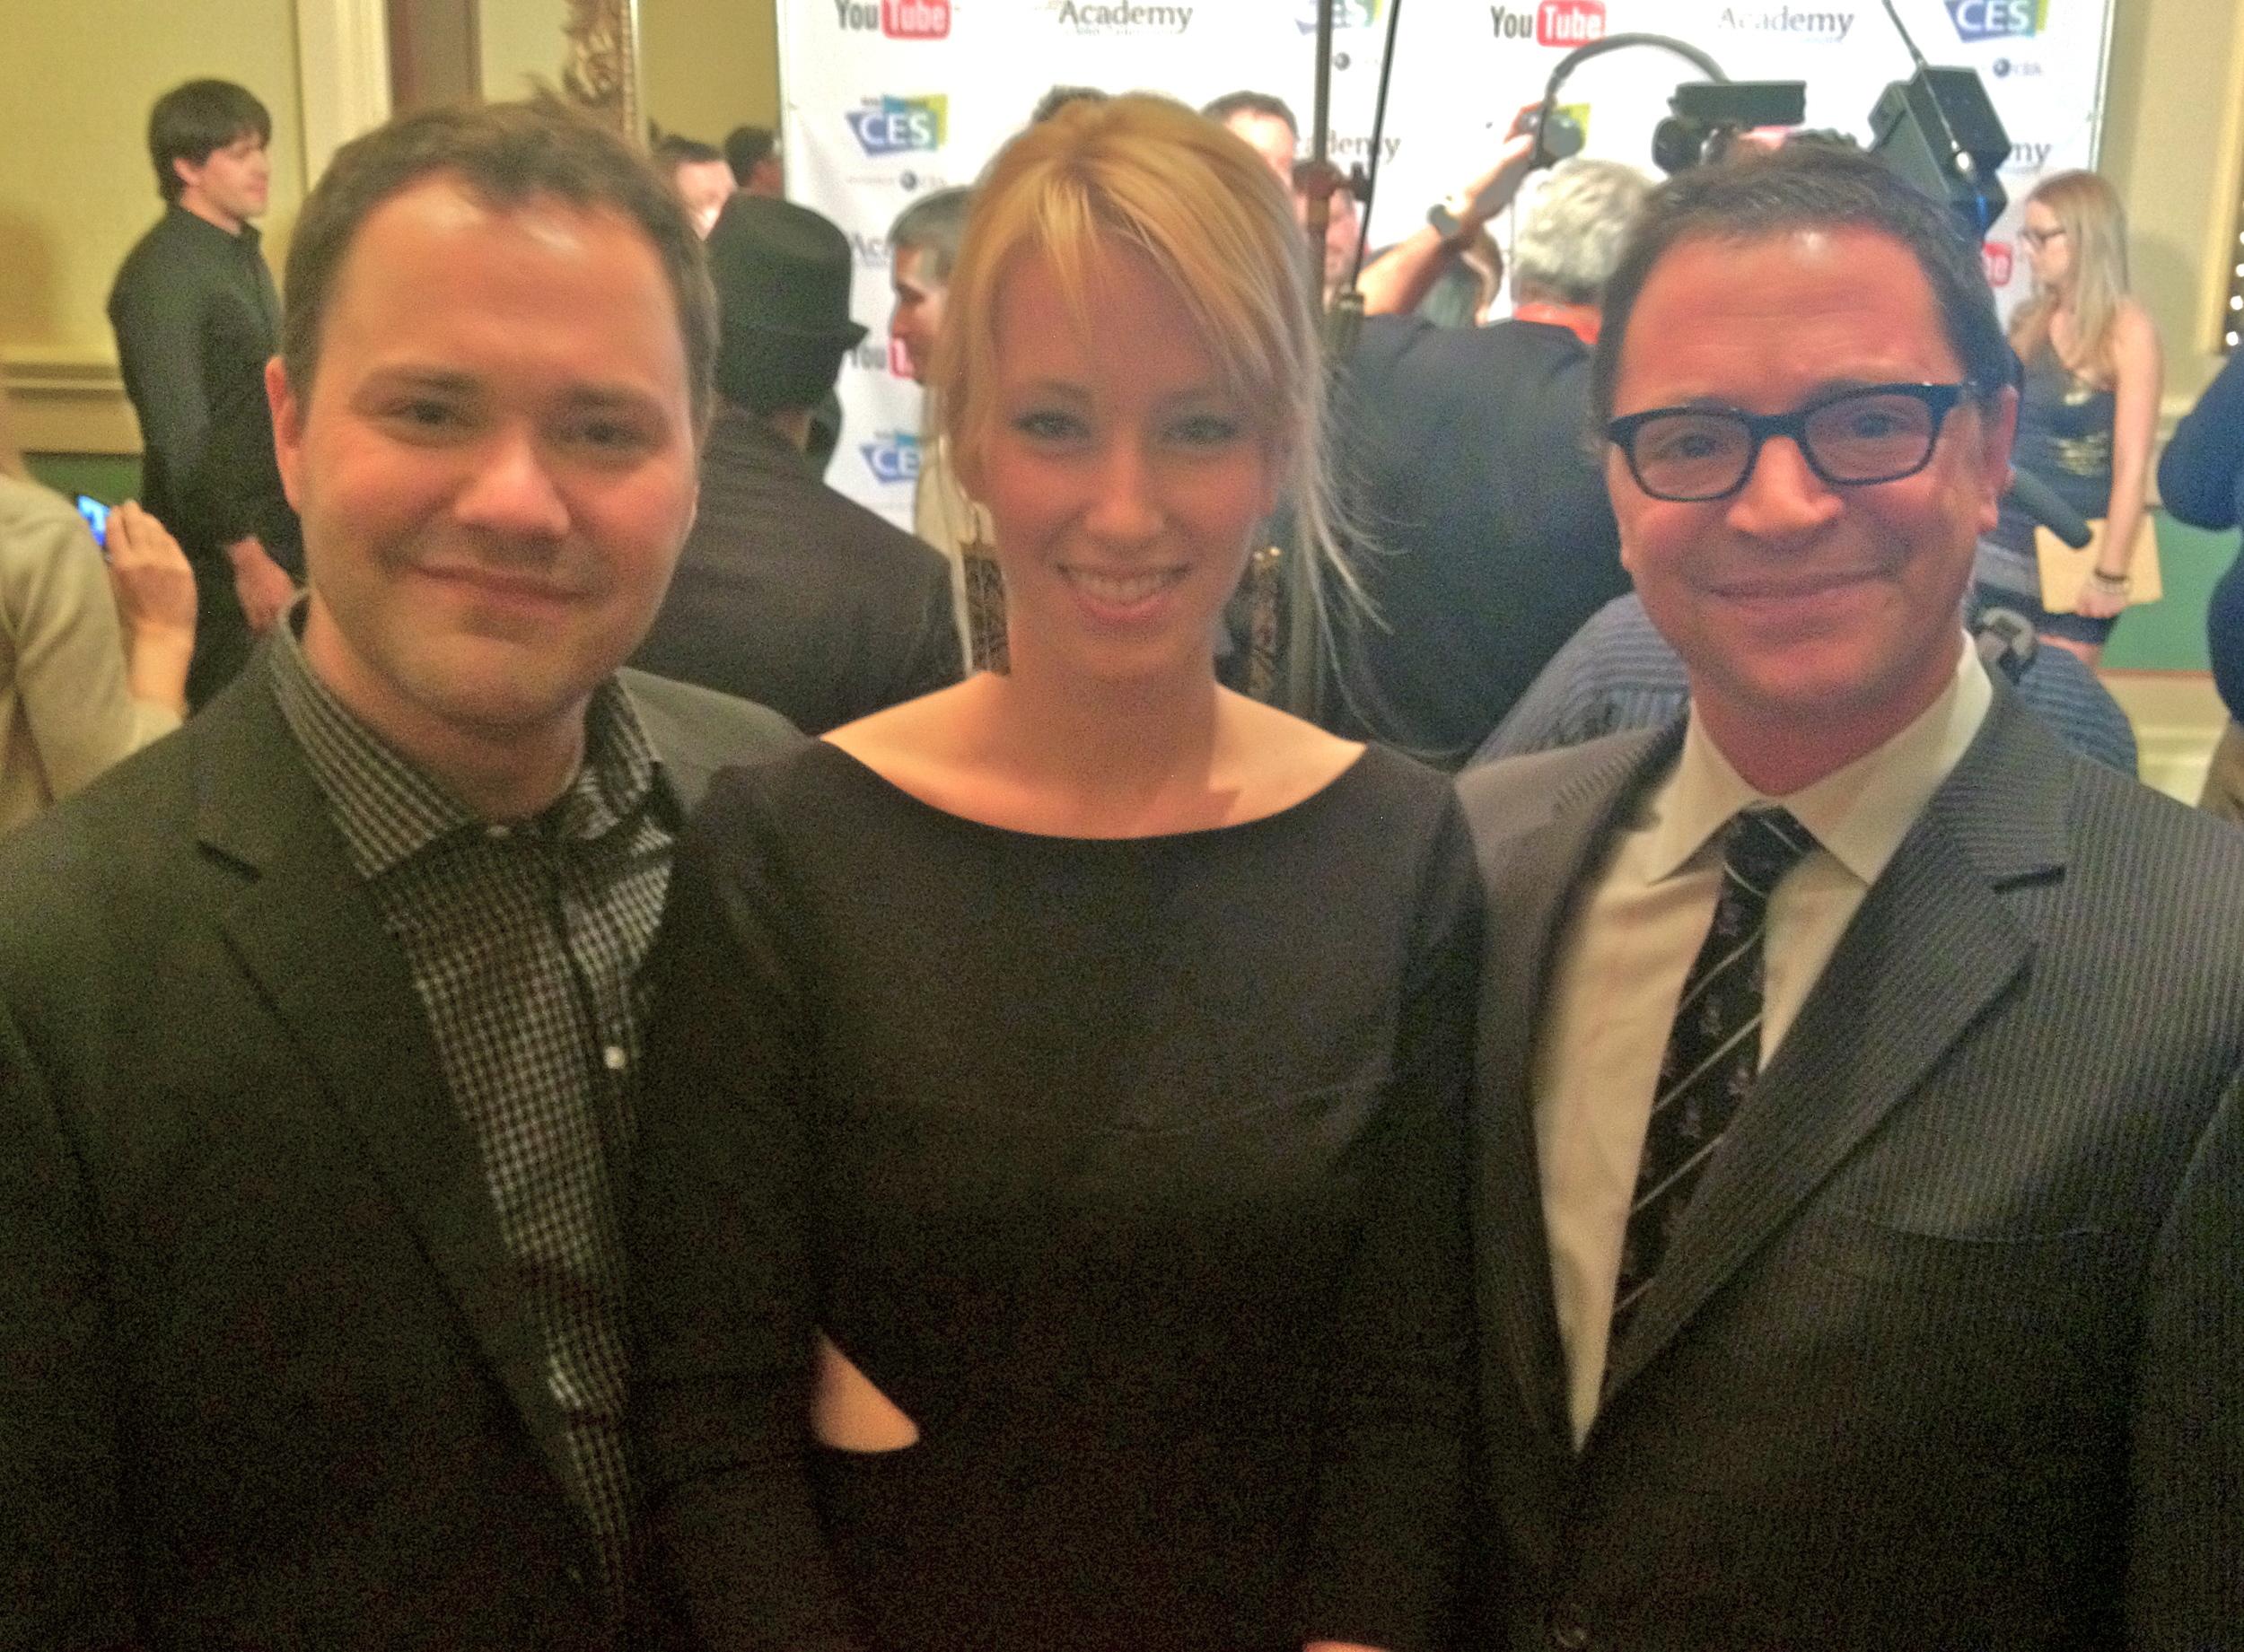 Wilson Cleveland, Alexis Boozer and Joshua Malina at the IAWTV Awards